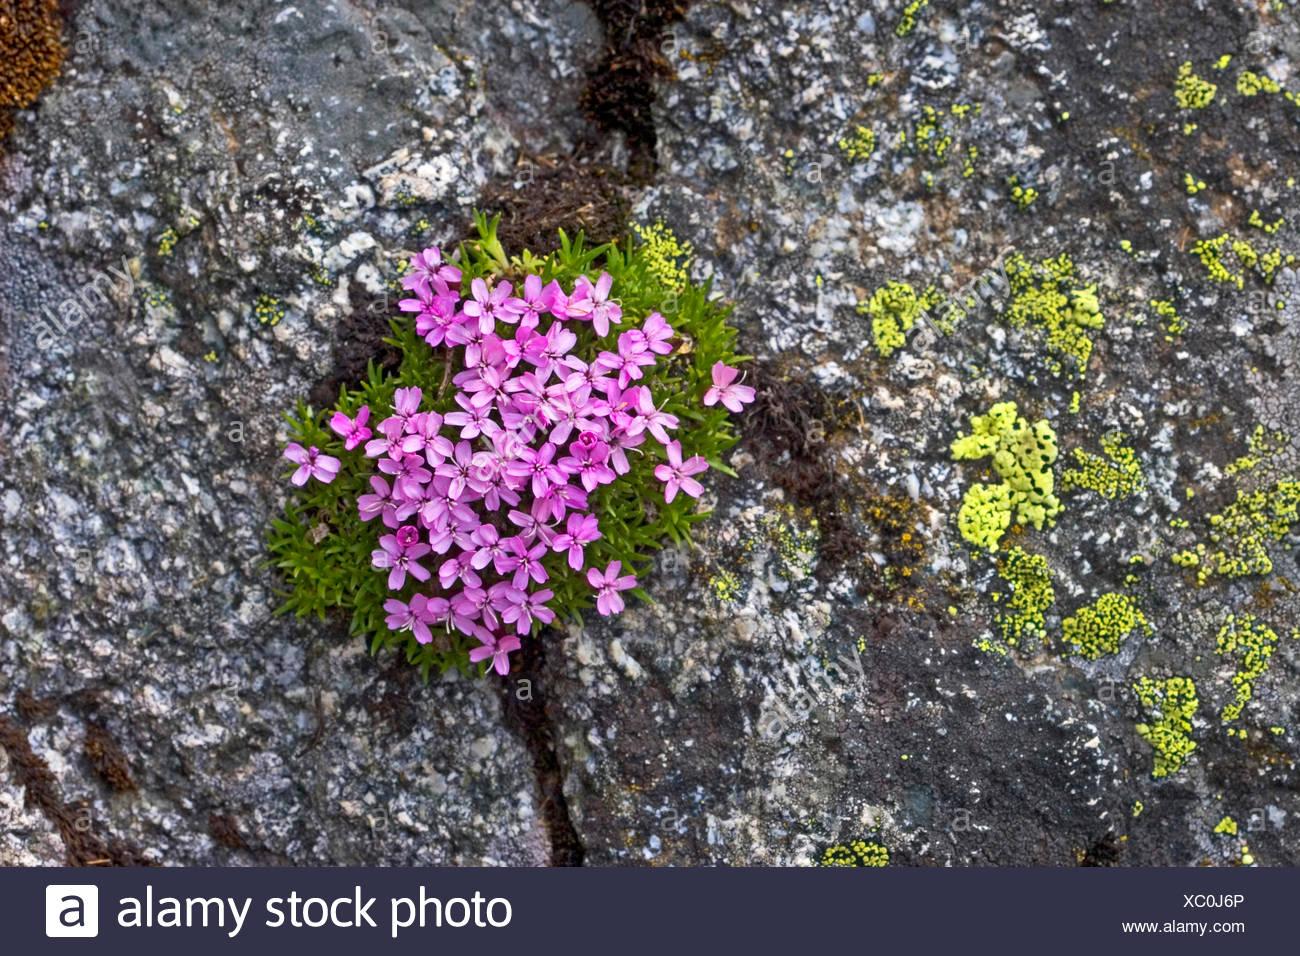 Moss campion, Cushion Pink (Silene acaulis), blooming, Germany - Stock Image